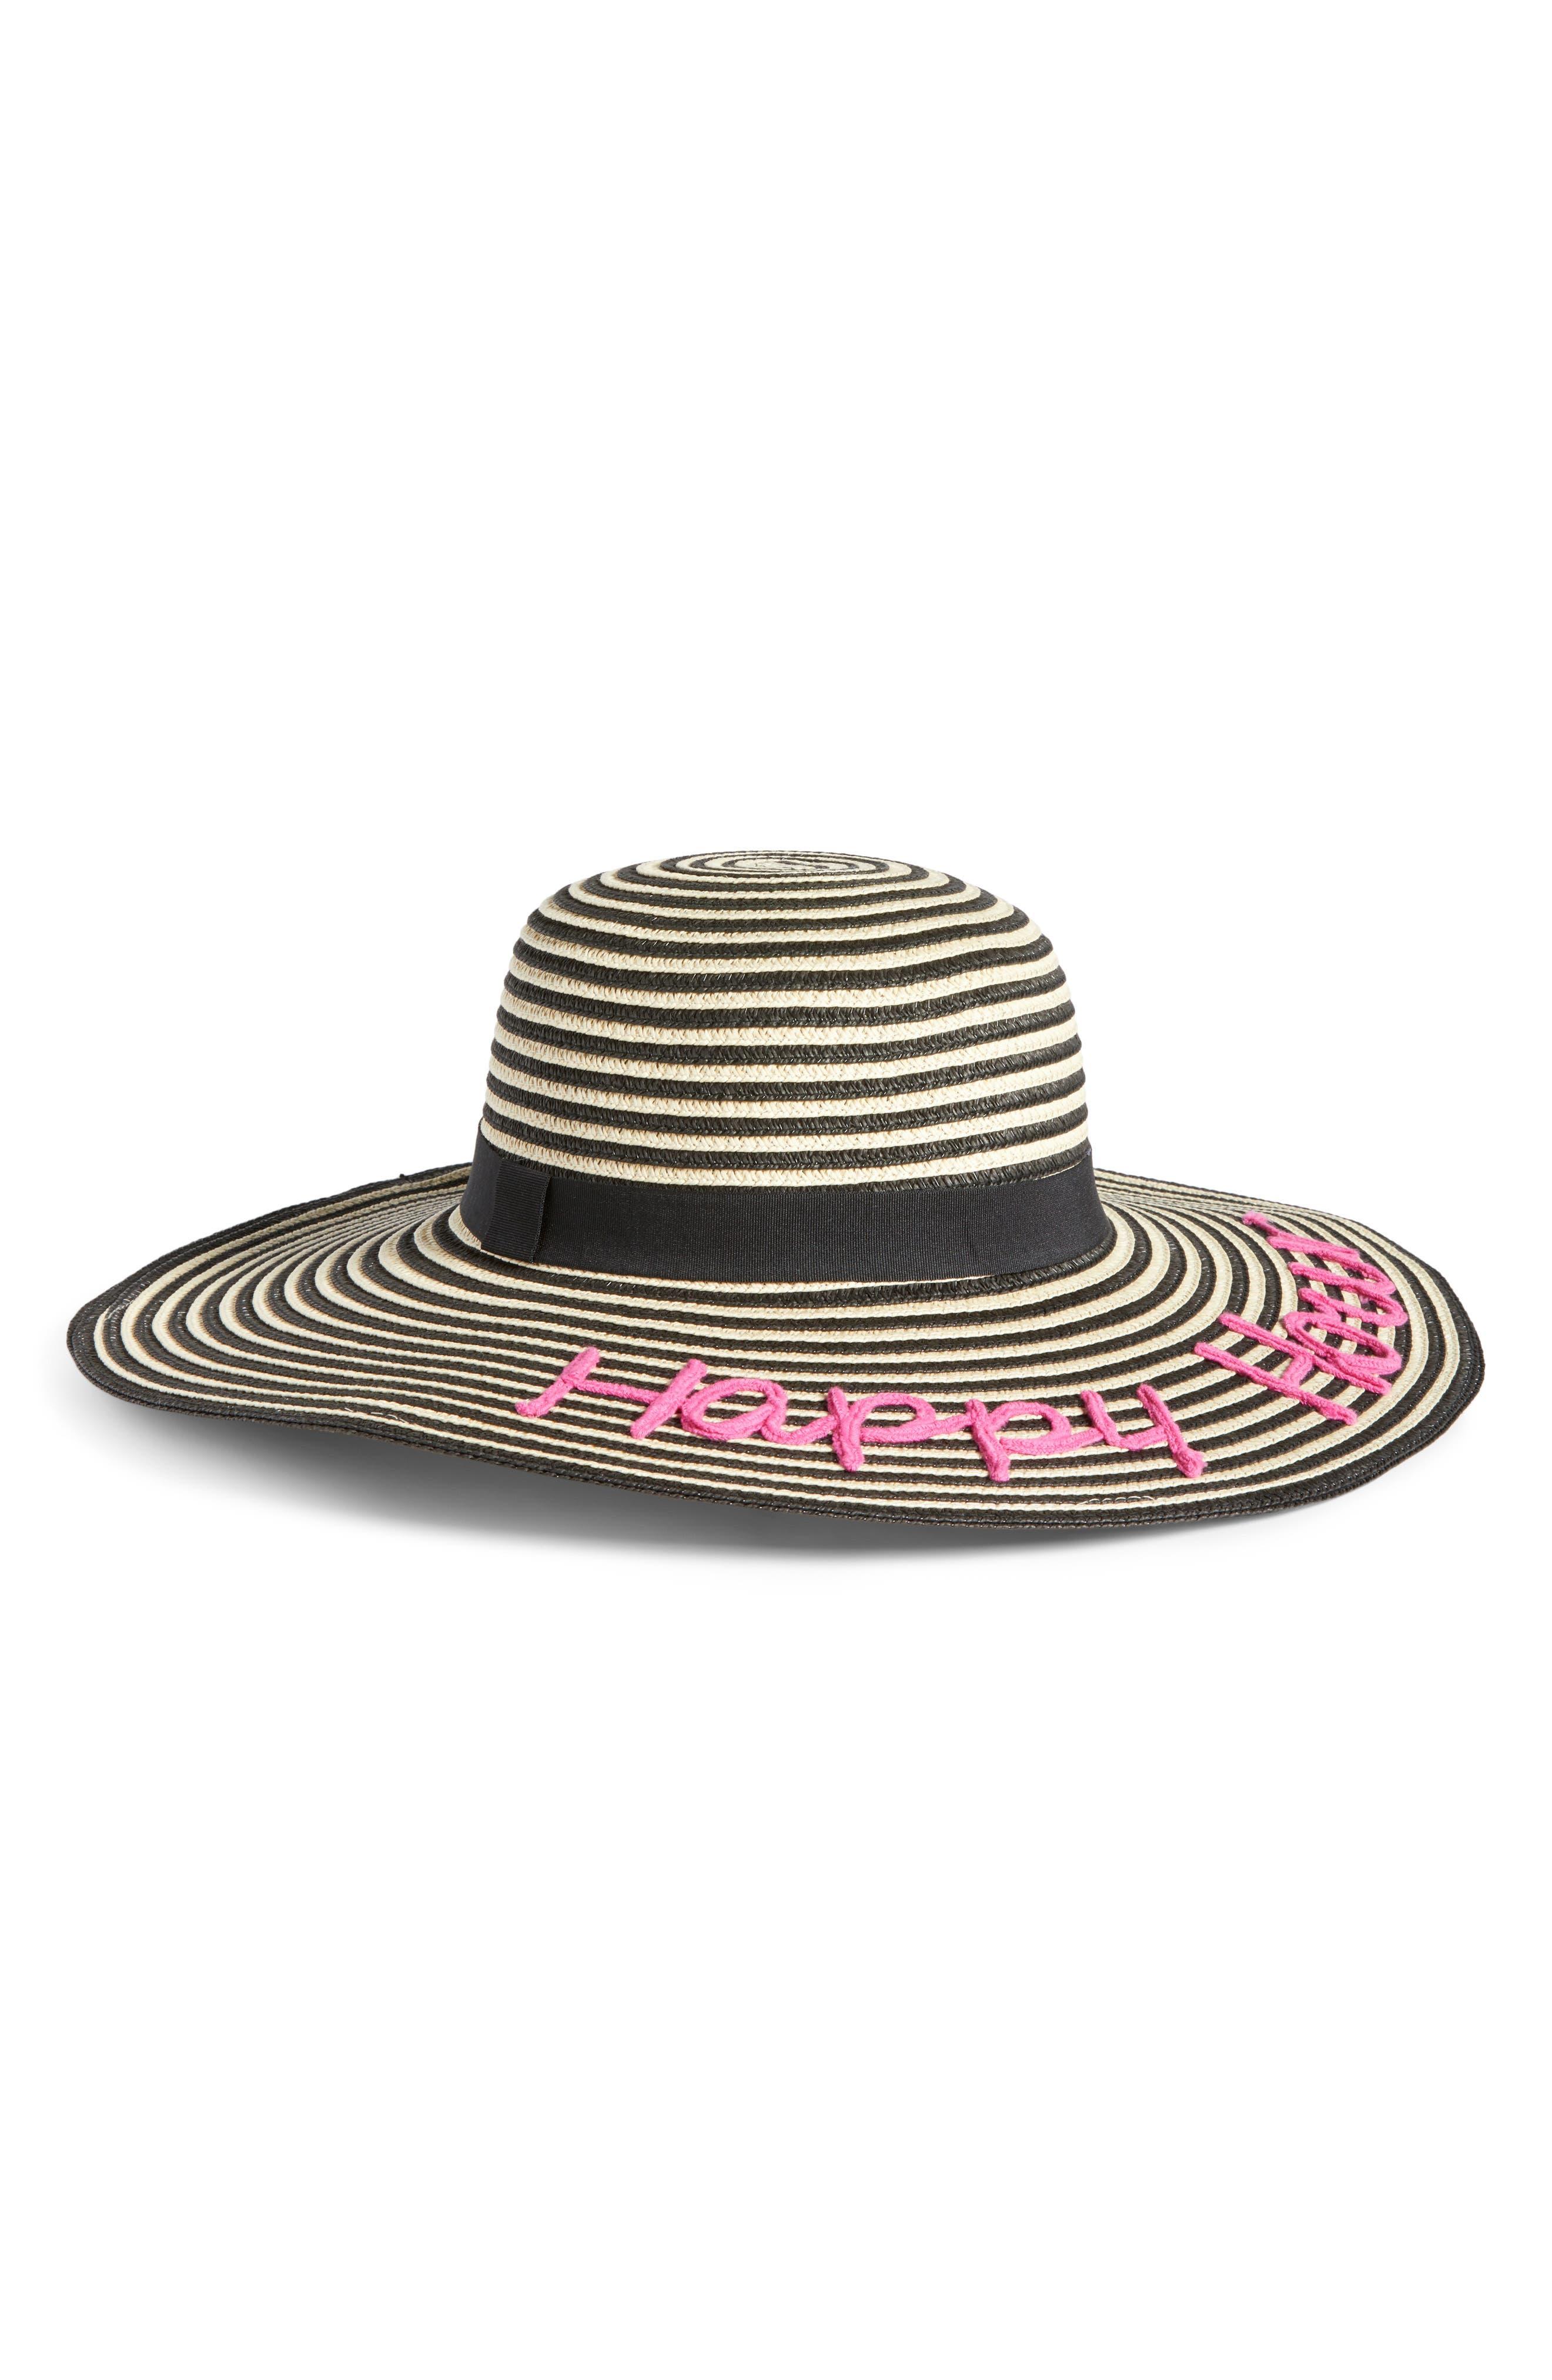 August Hat Crossword Straw Hat